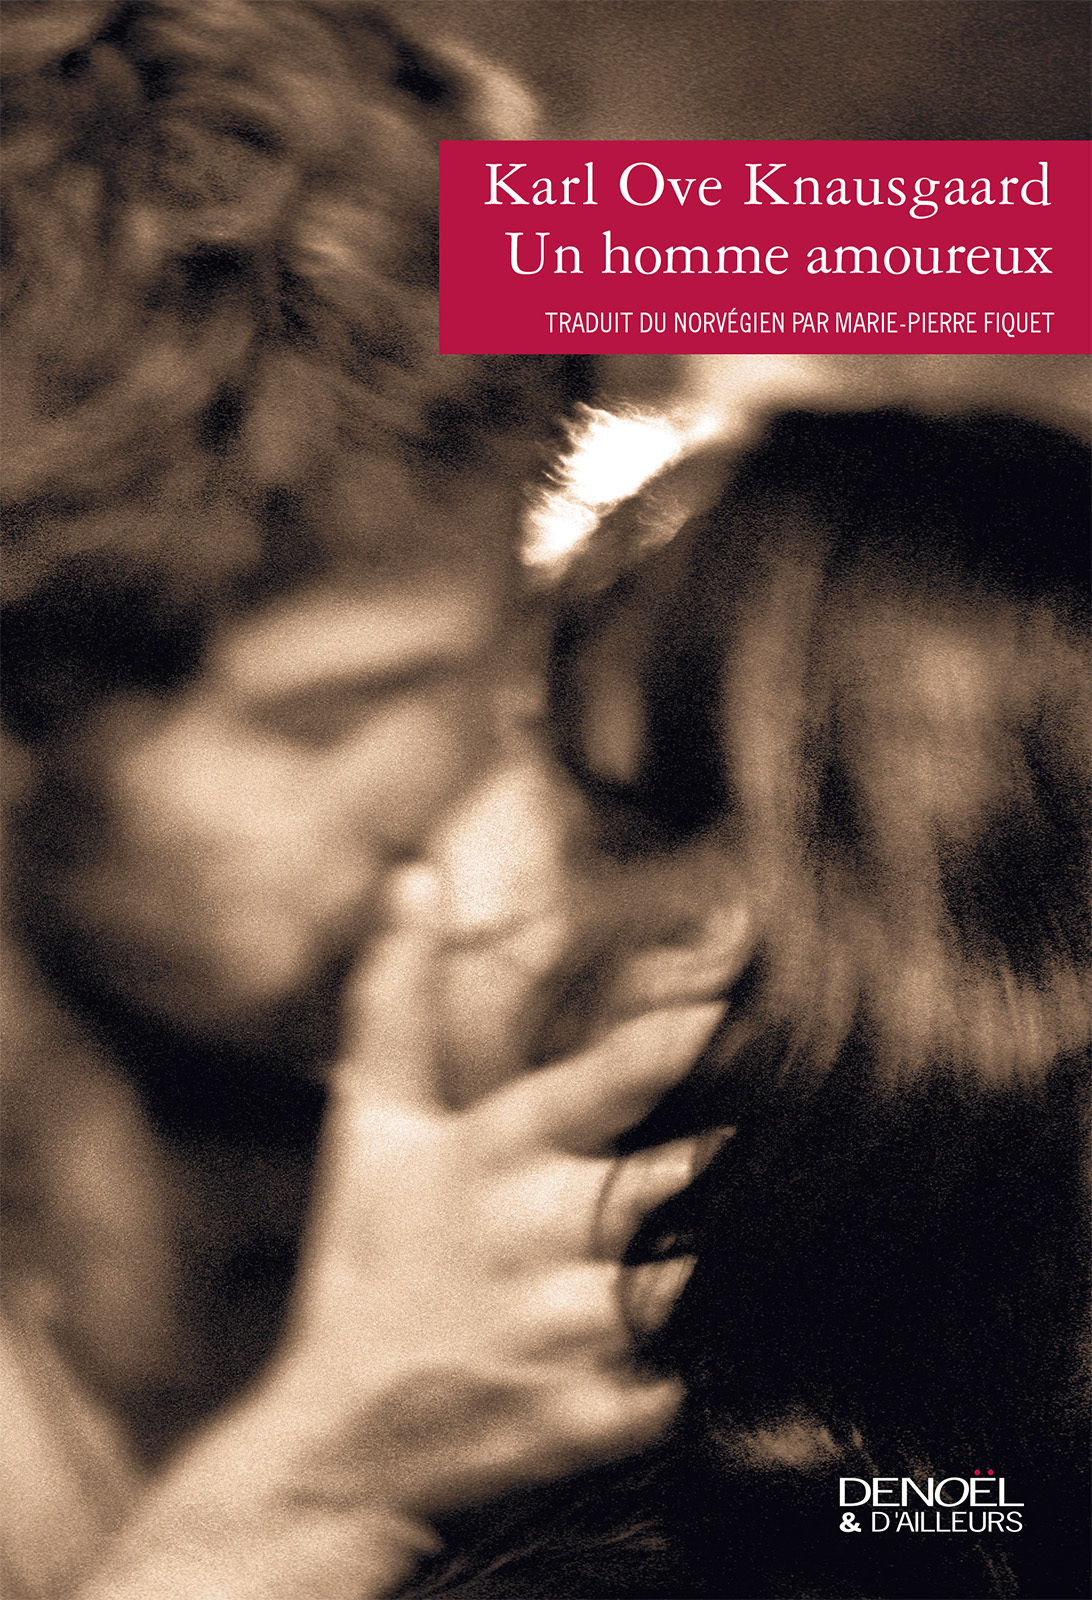 Un homme amoureux | Knausgård, Karl Ove